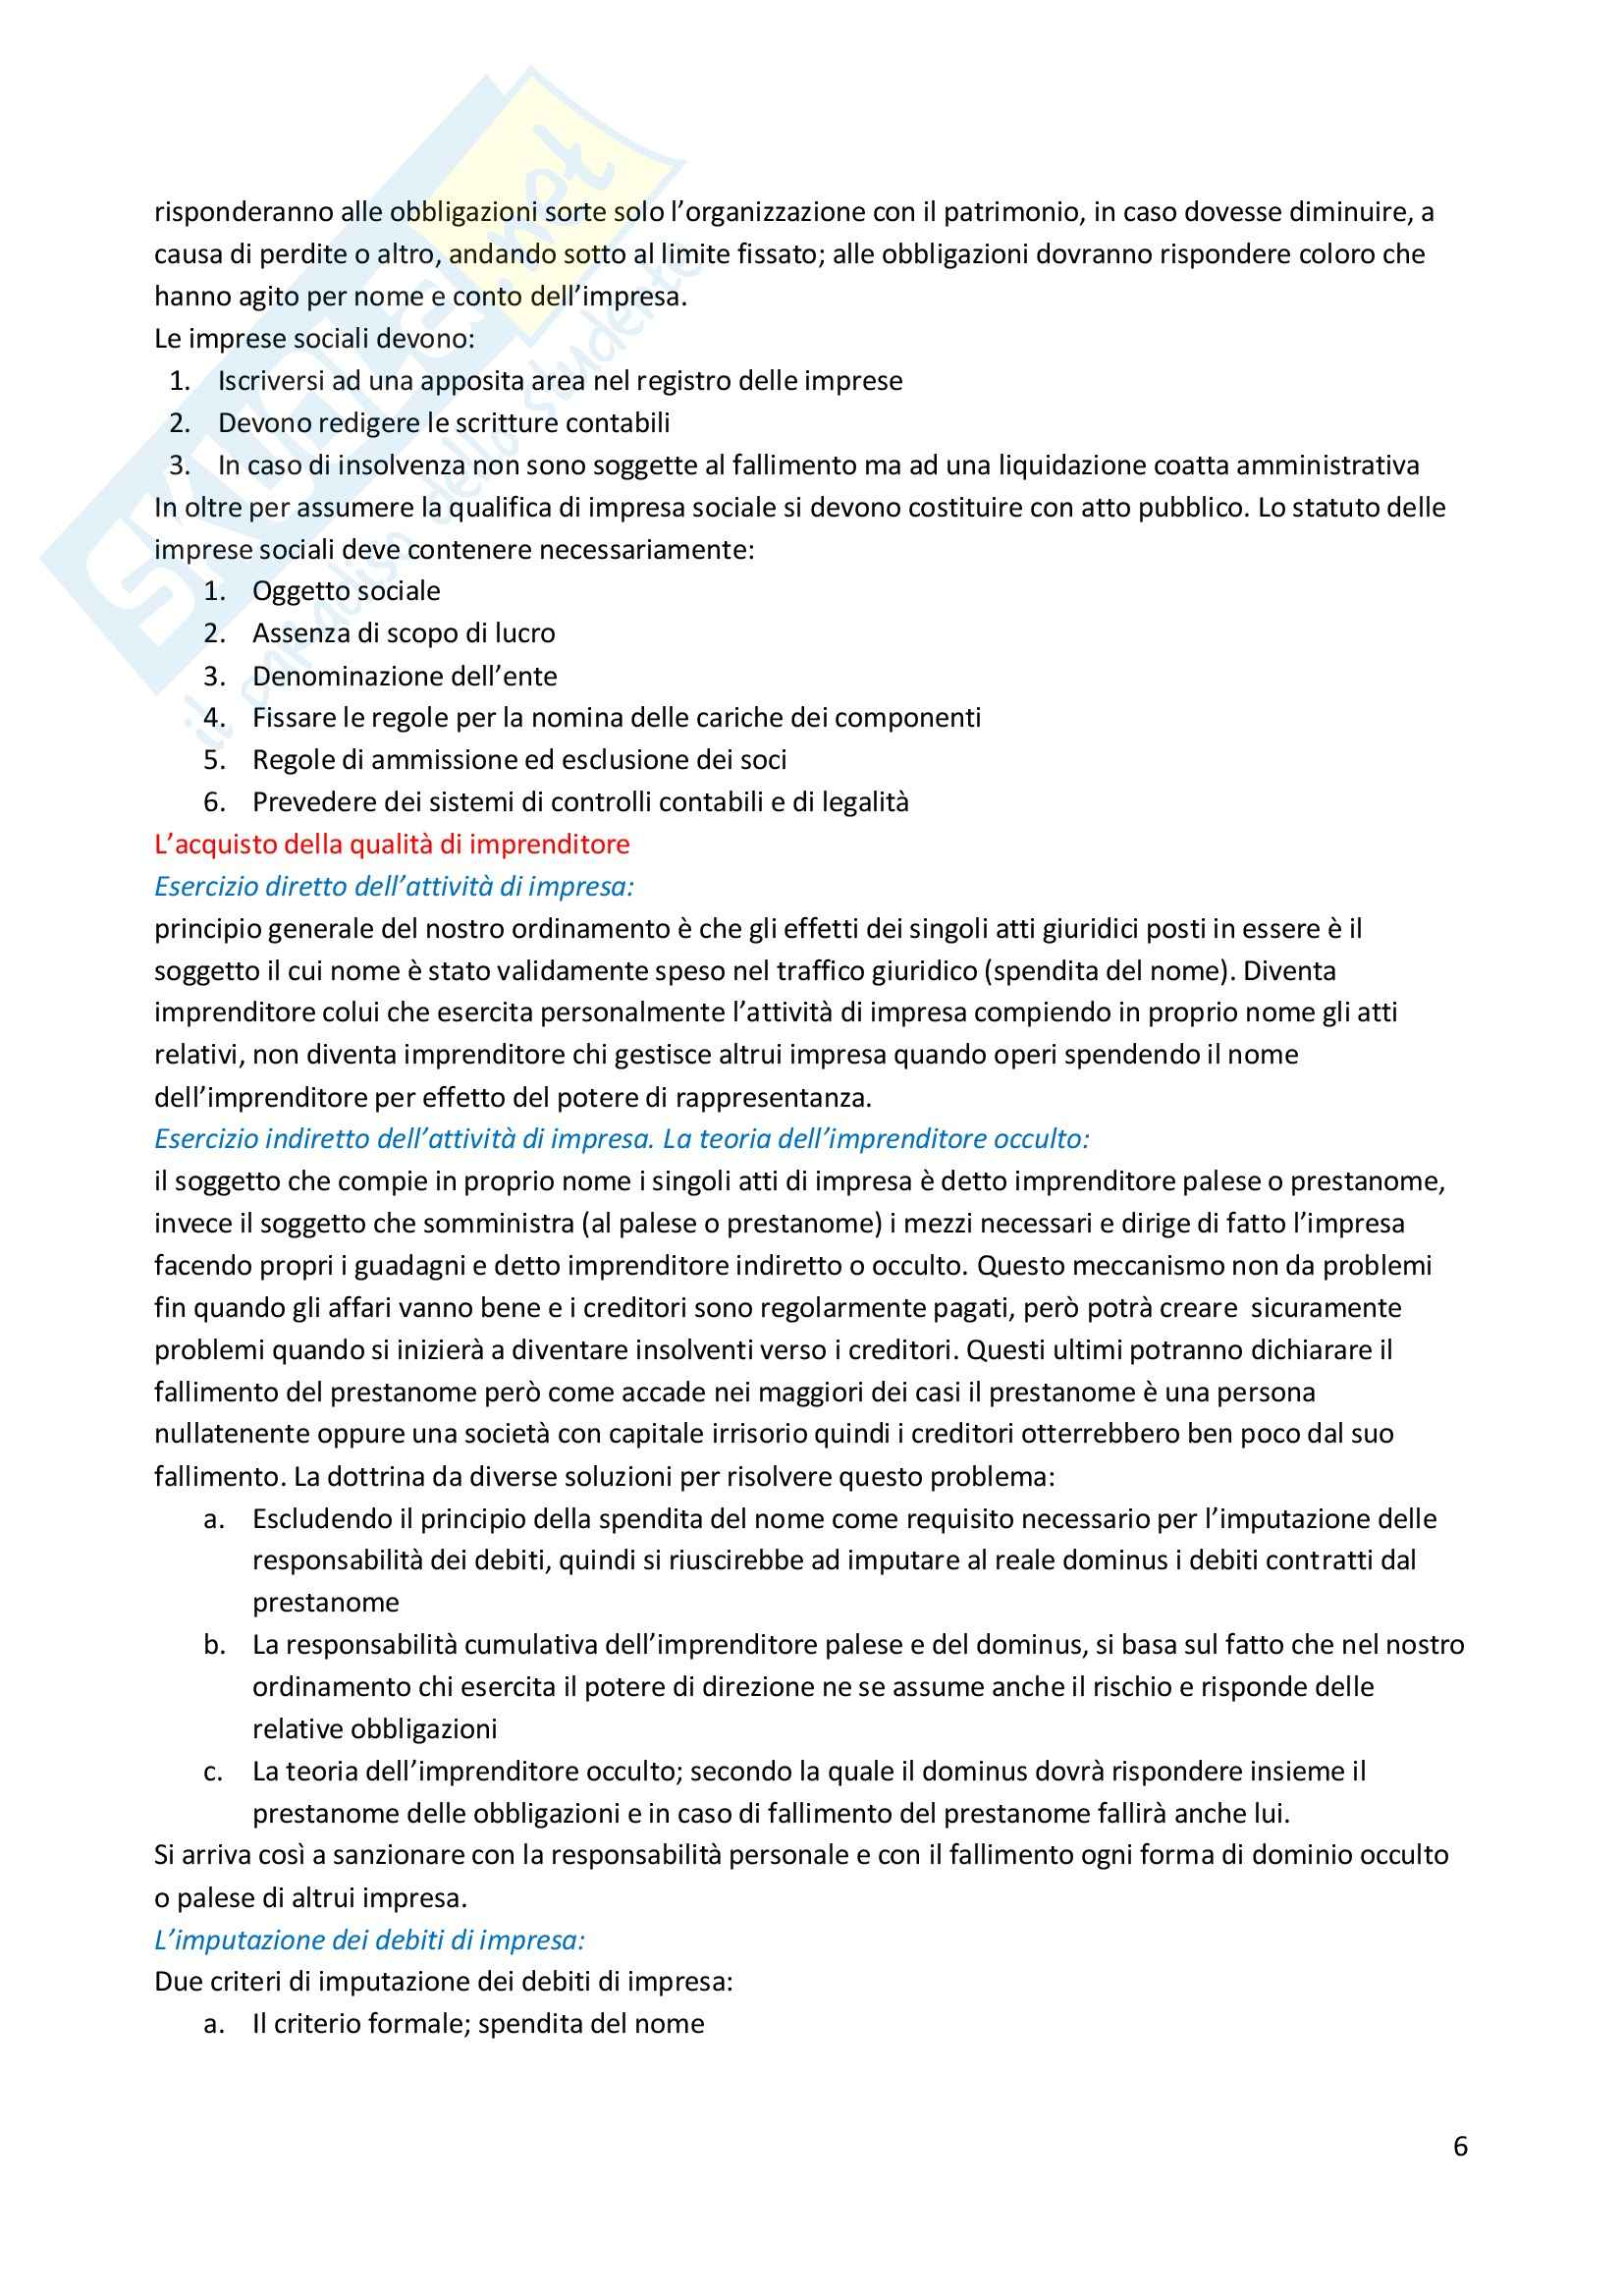 Riassunto esame Diritto Commerciale, prof. Bocchiola Pag. 6